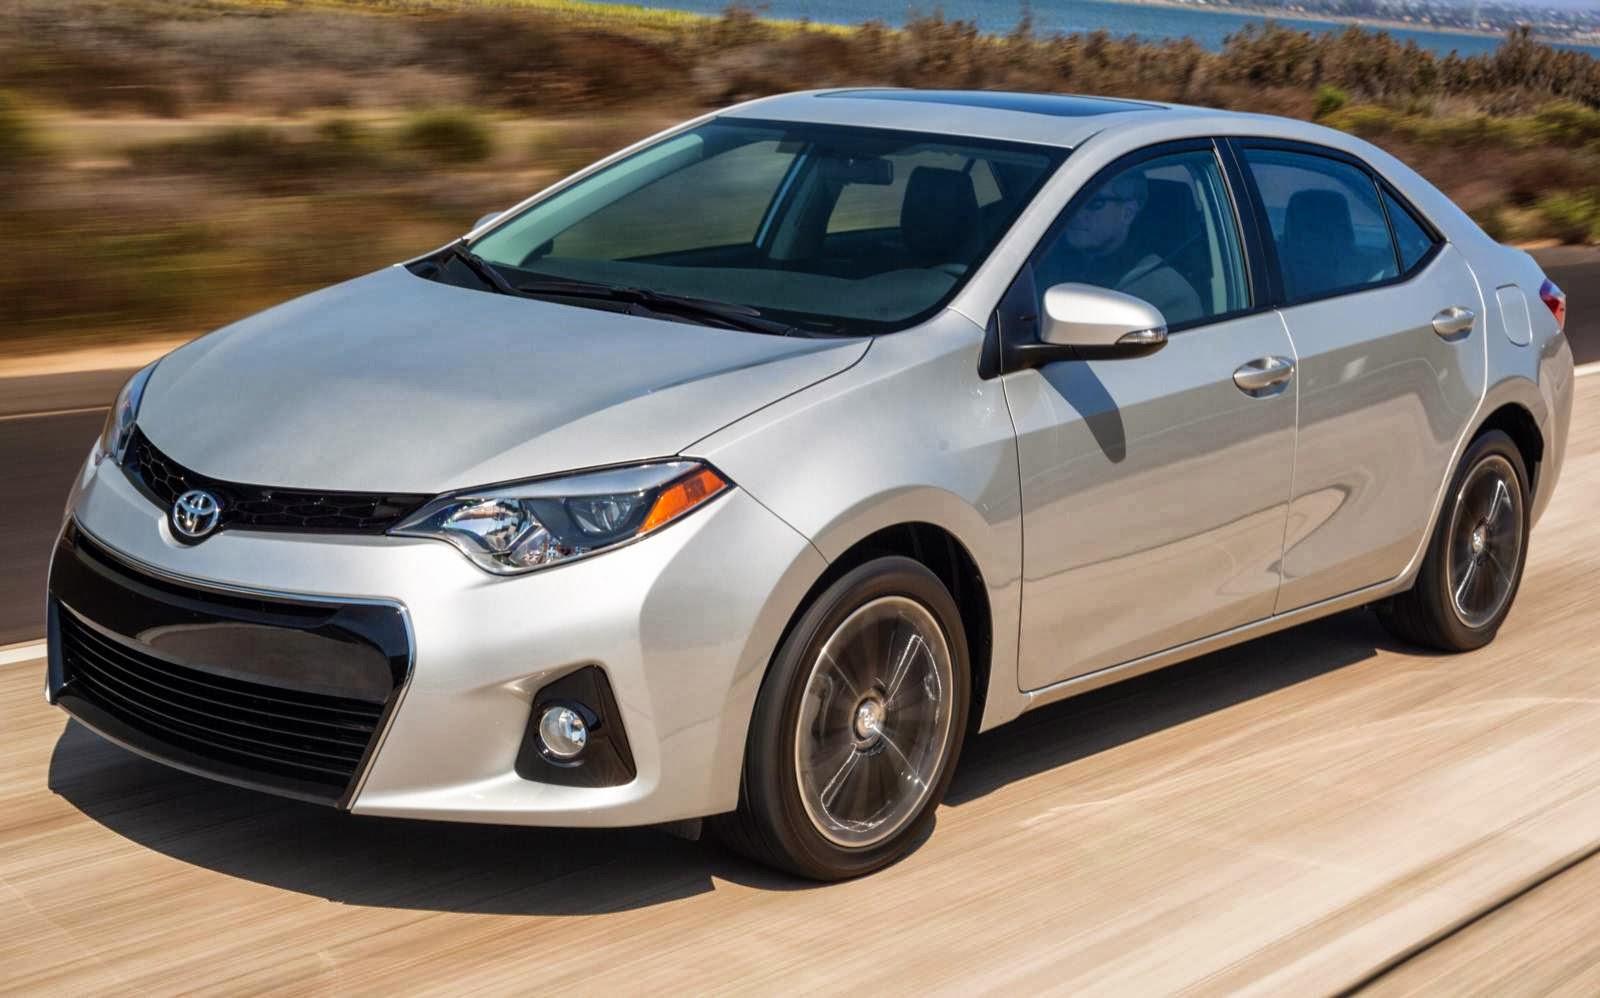 Corolla 2014 Tire Size >> 2010 Toyota Corolla Xrs For Sale 2014.html | Autos Post